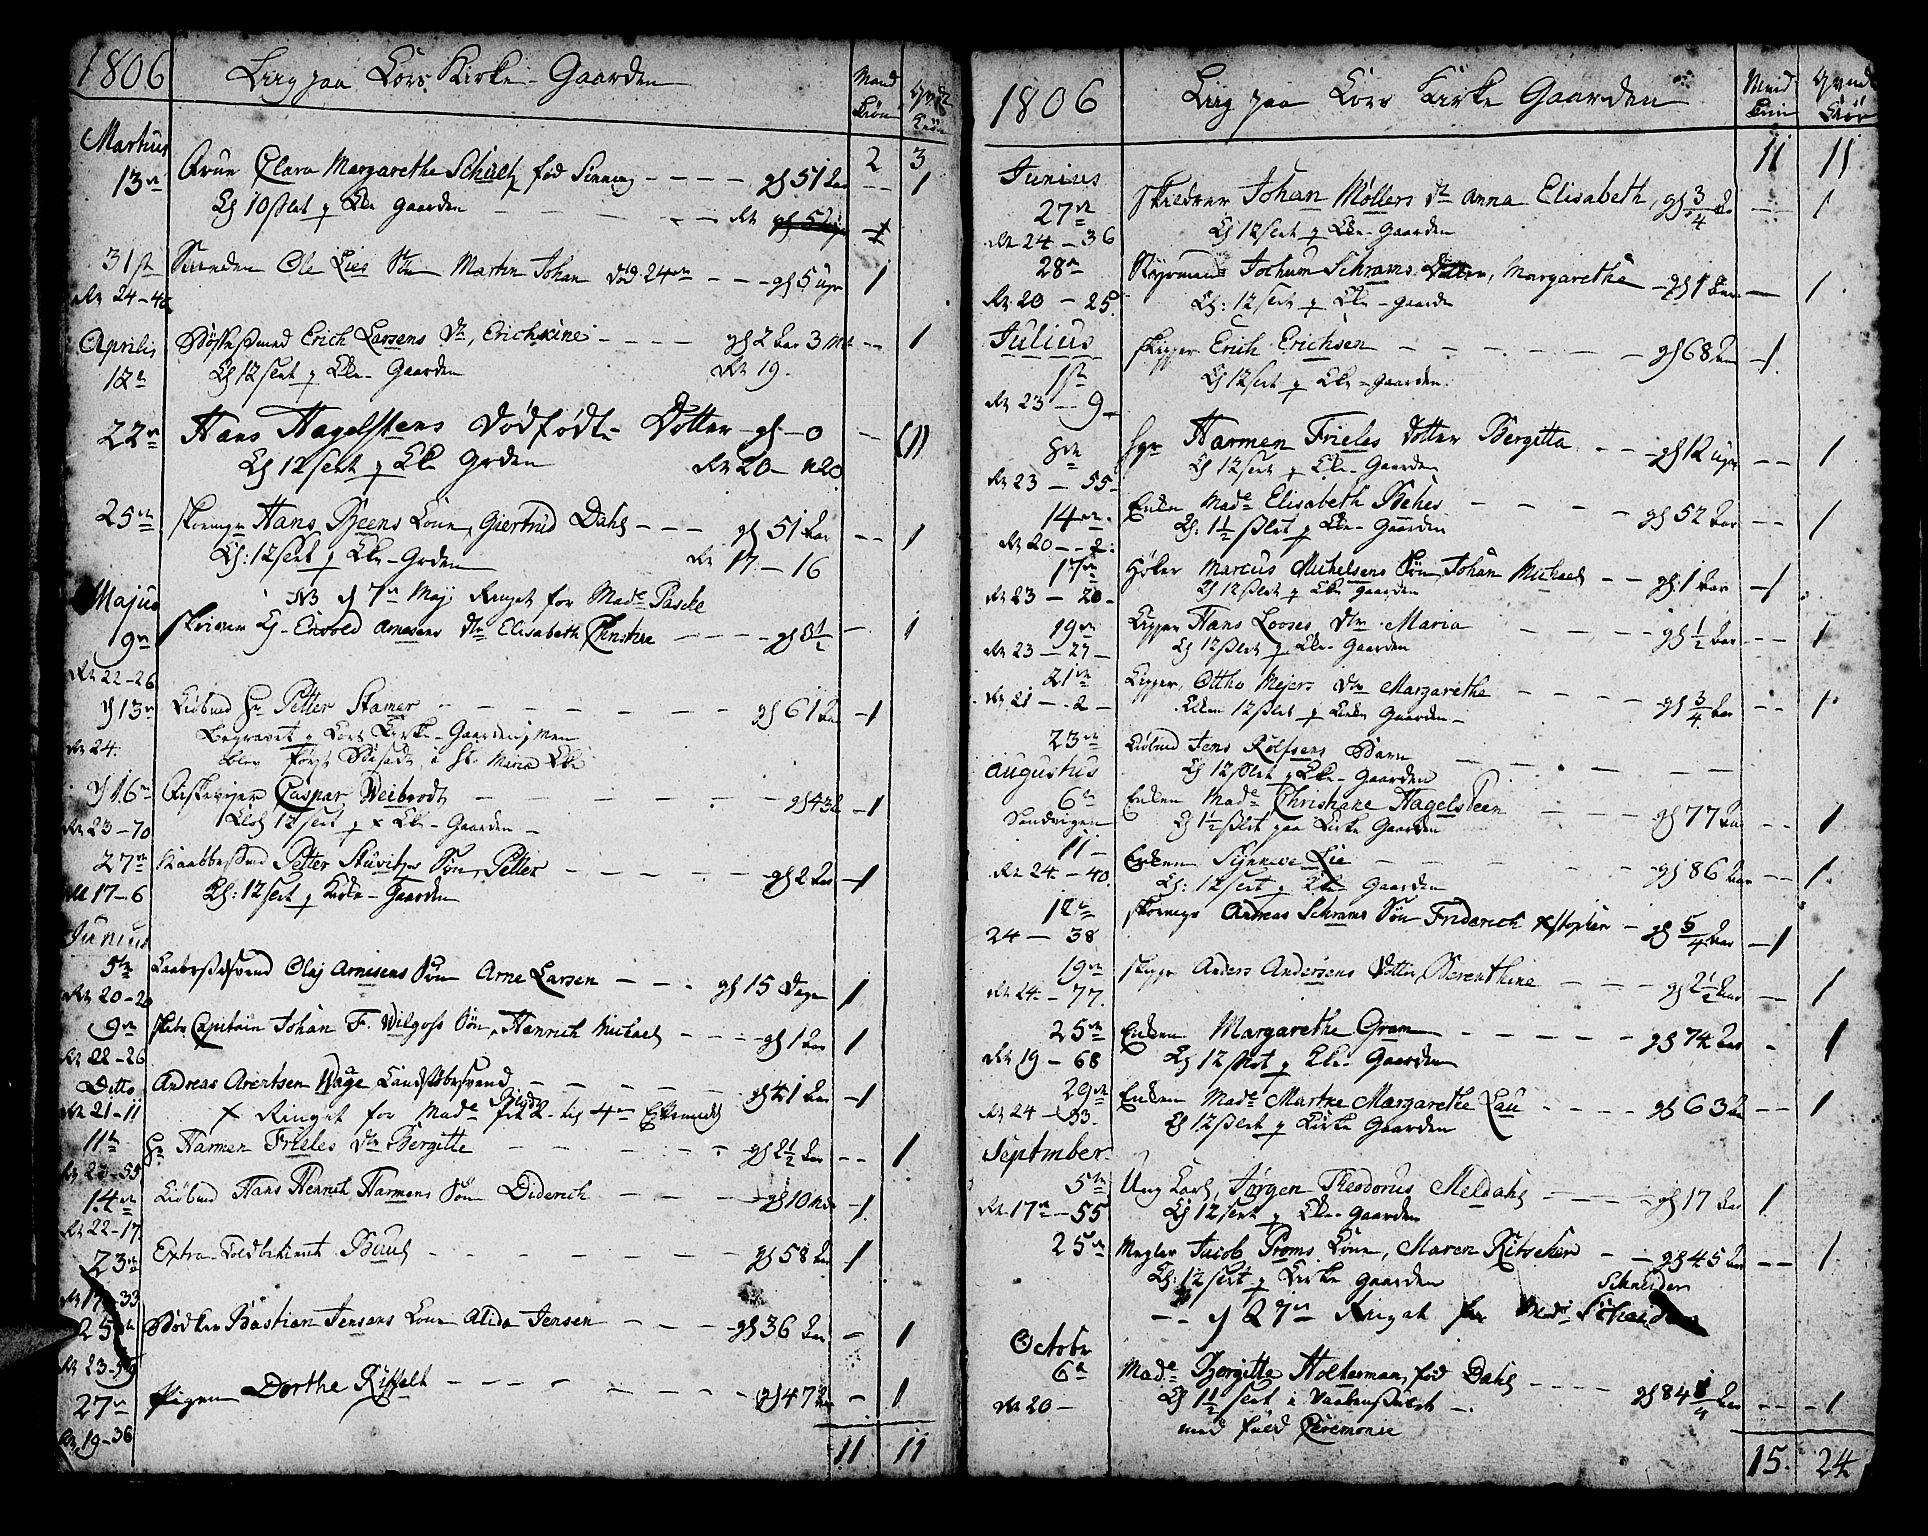 SAB, Korskirken Sokneprestembete, H/Haa/L0012: Ministerialbok nr. A 12, 1786-1832, s. 149